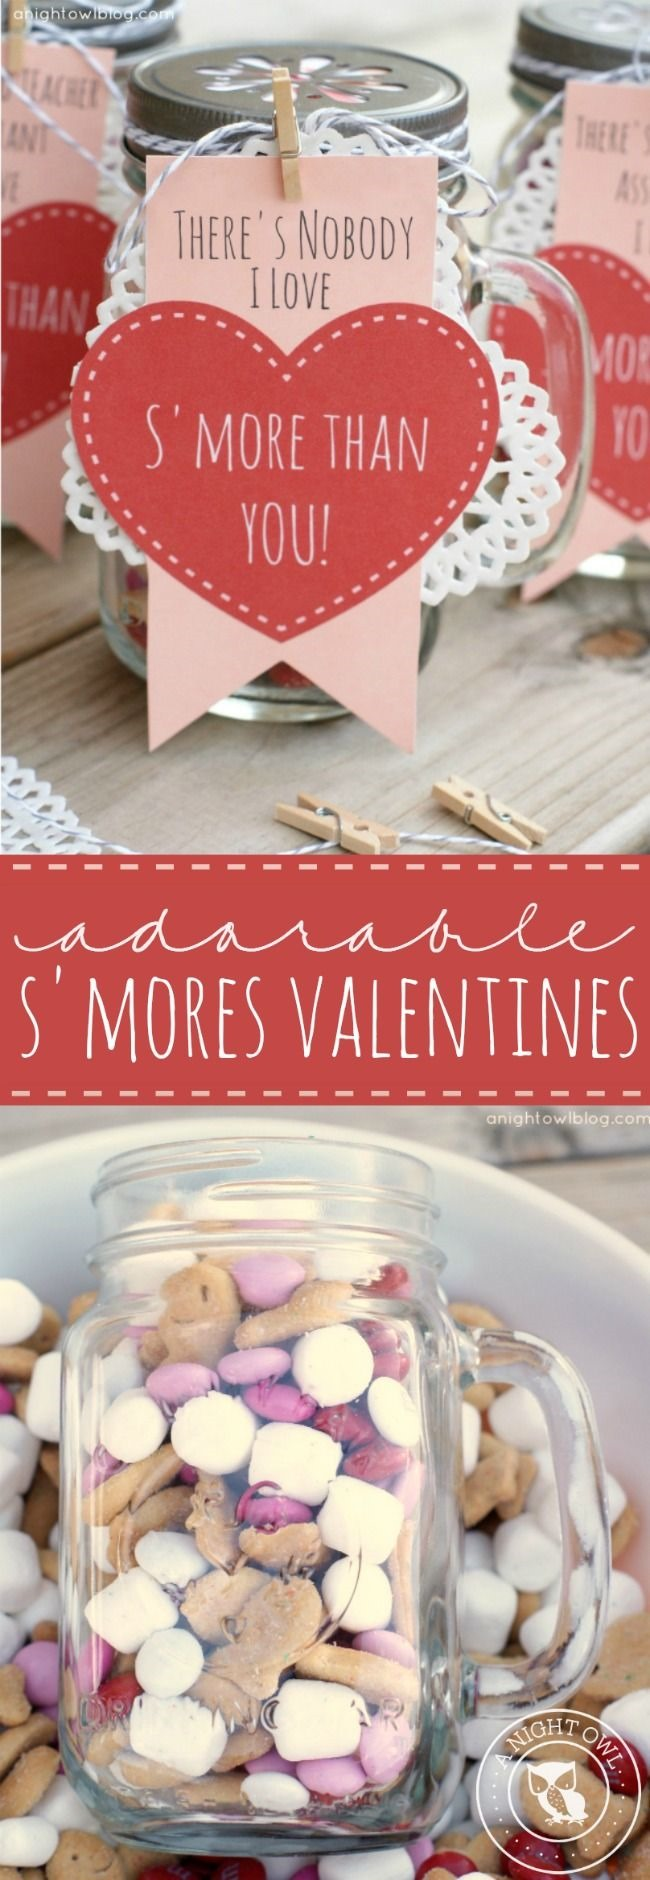 smores_valentine_gifts_mason_jar